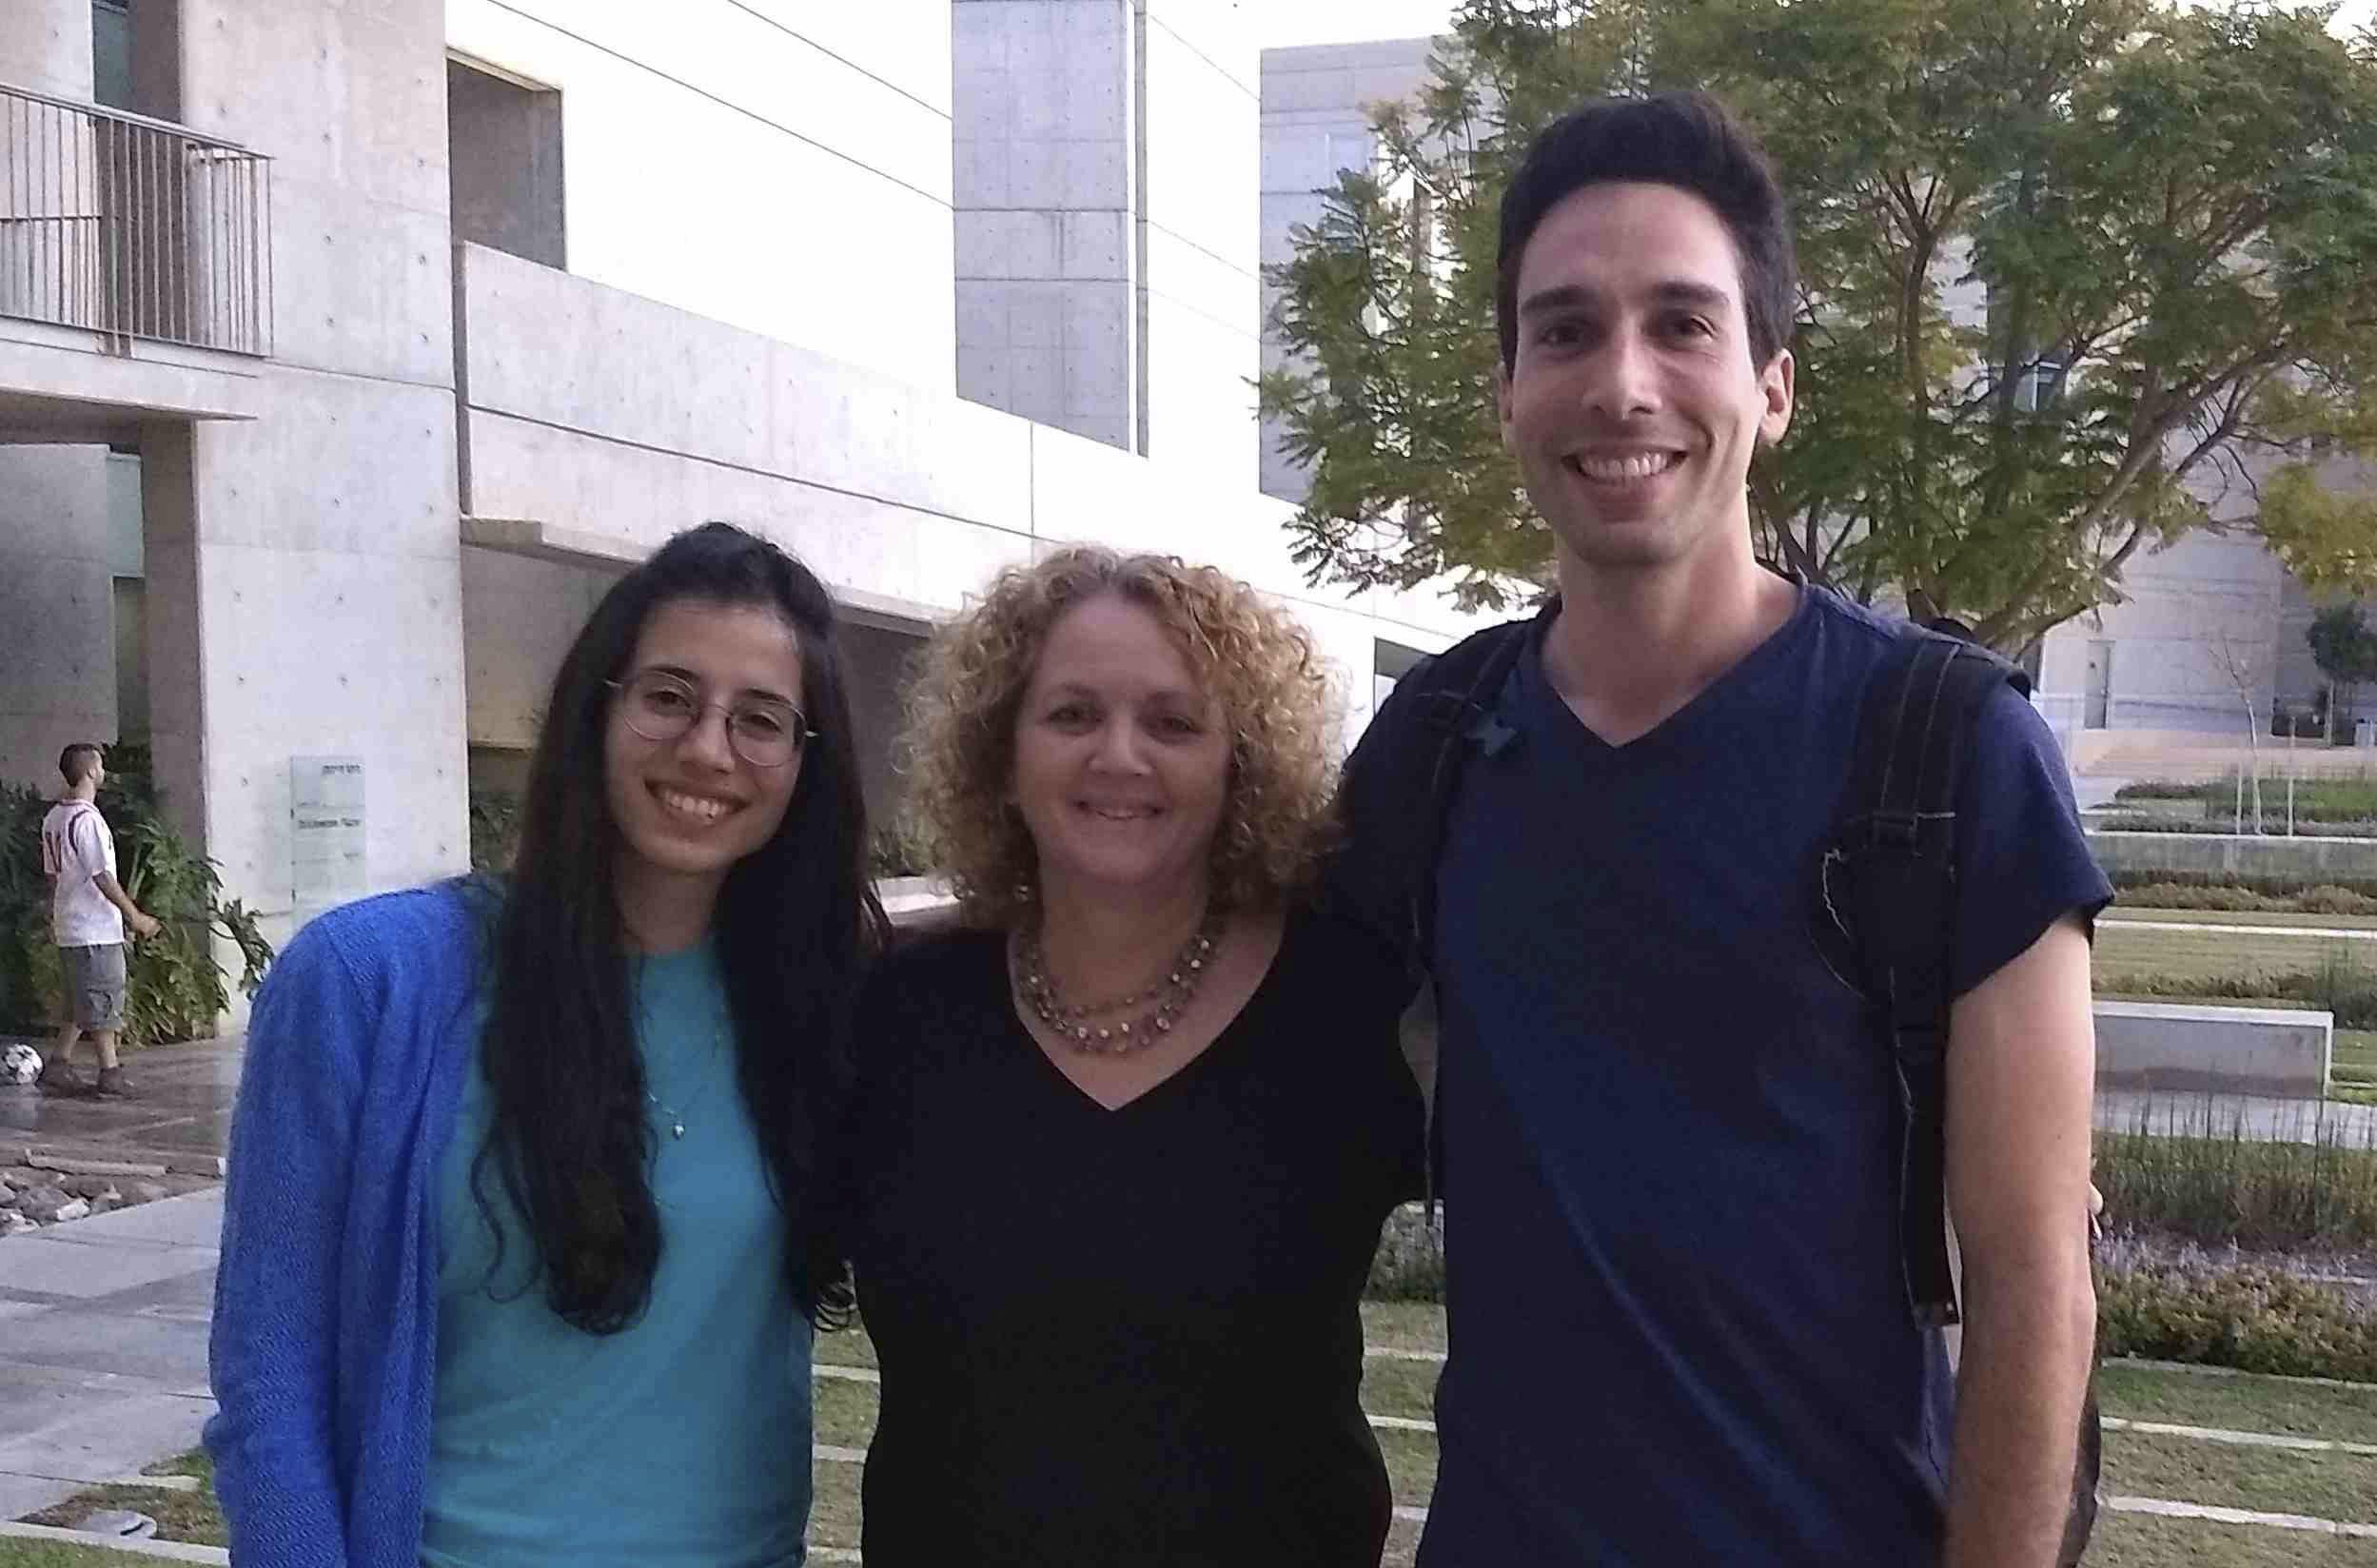 ChoosingTomorrowstudents Noa Gottesman (left) and Ido Brami (right) with coordinator Osnat Halachny Nir (Photo/Maya Mirsky)